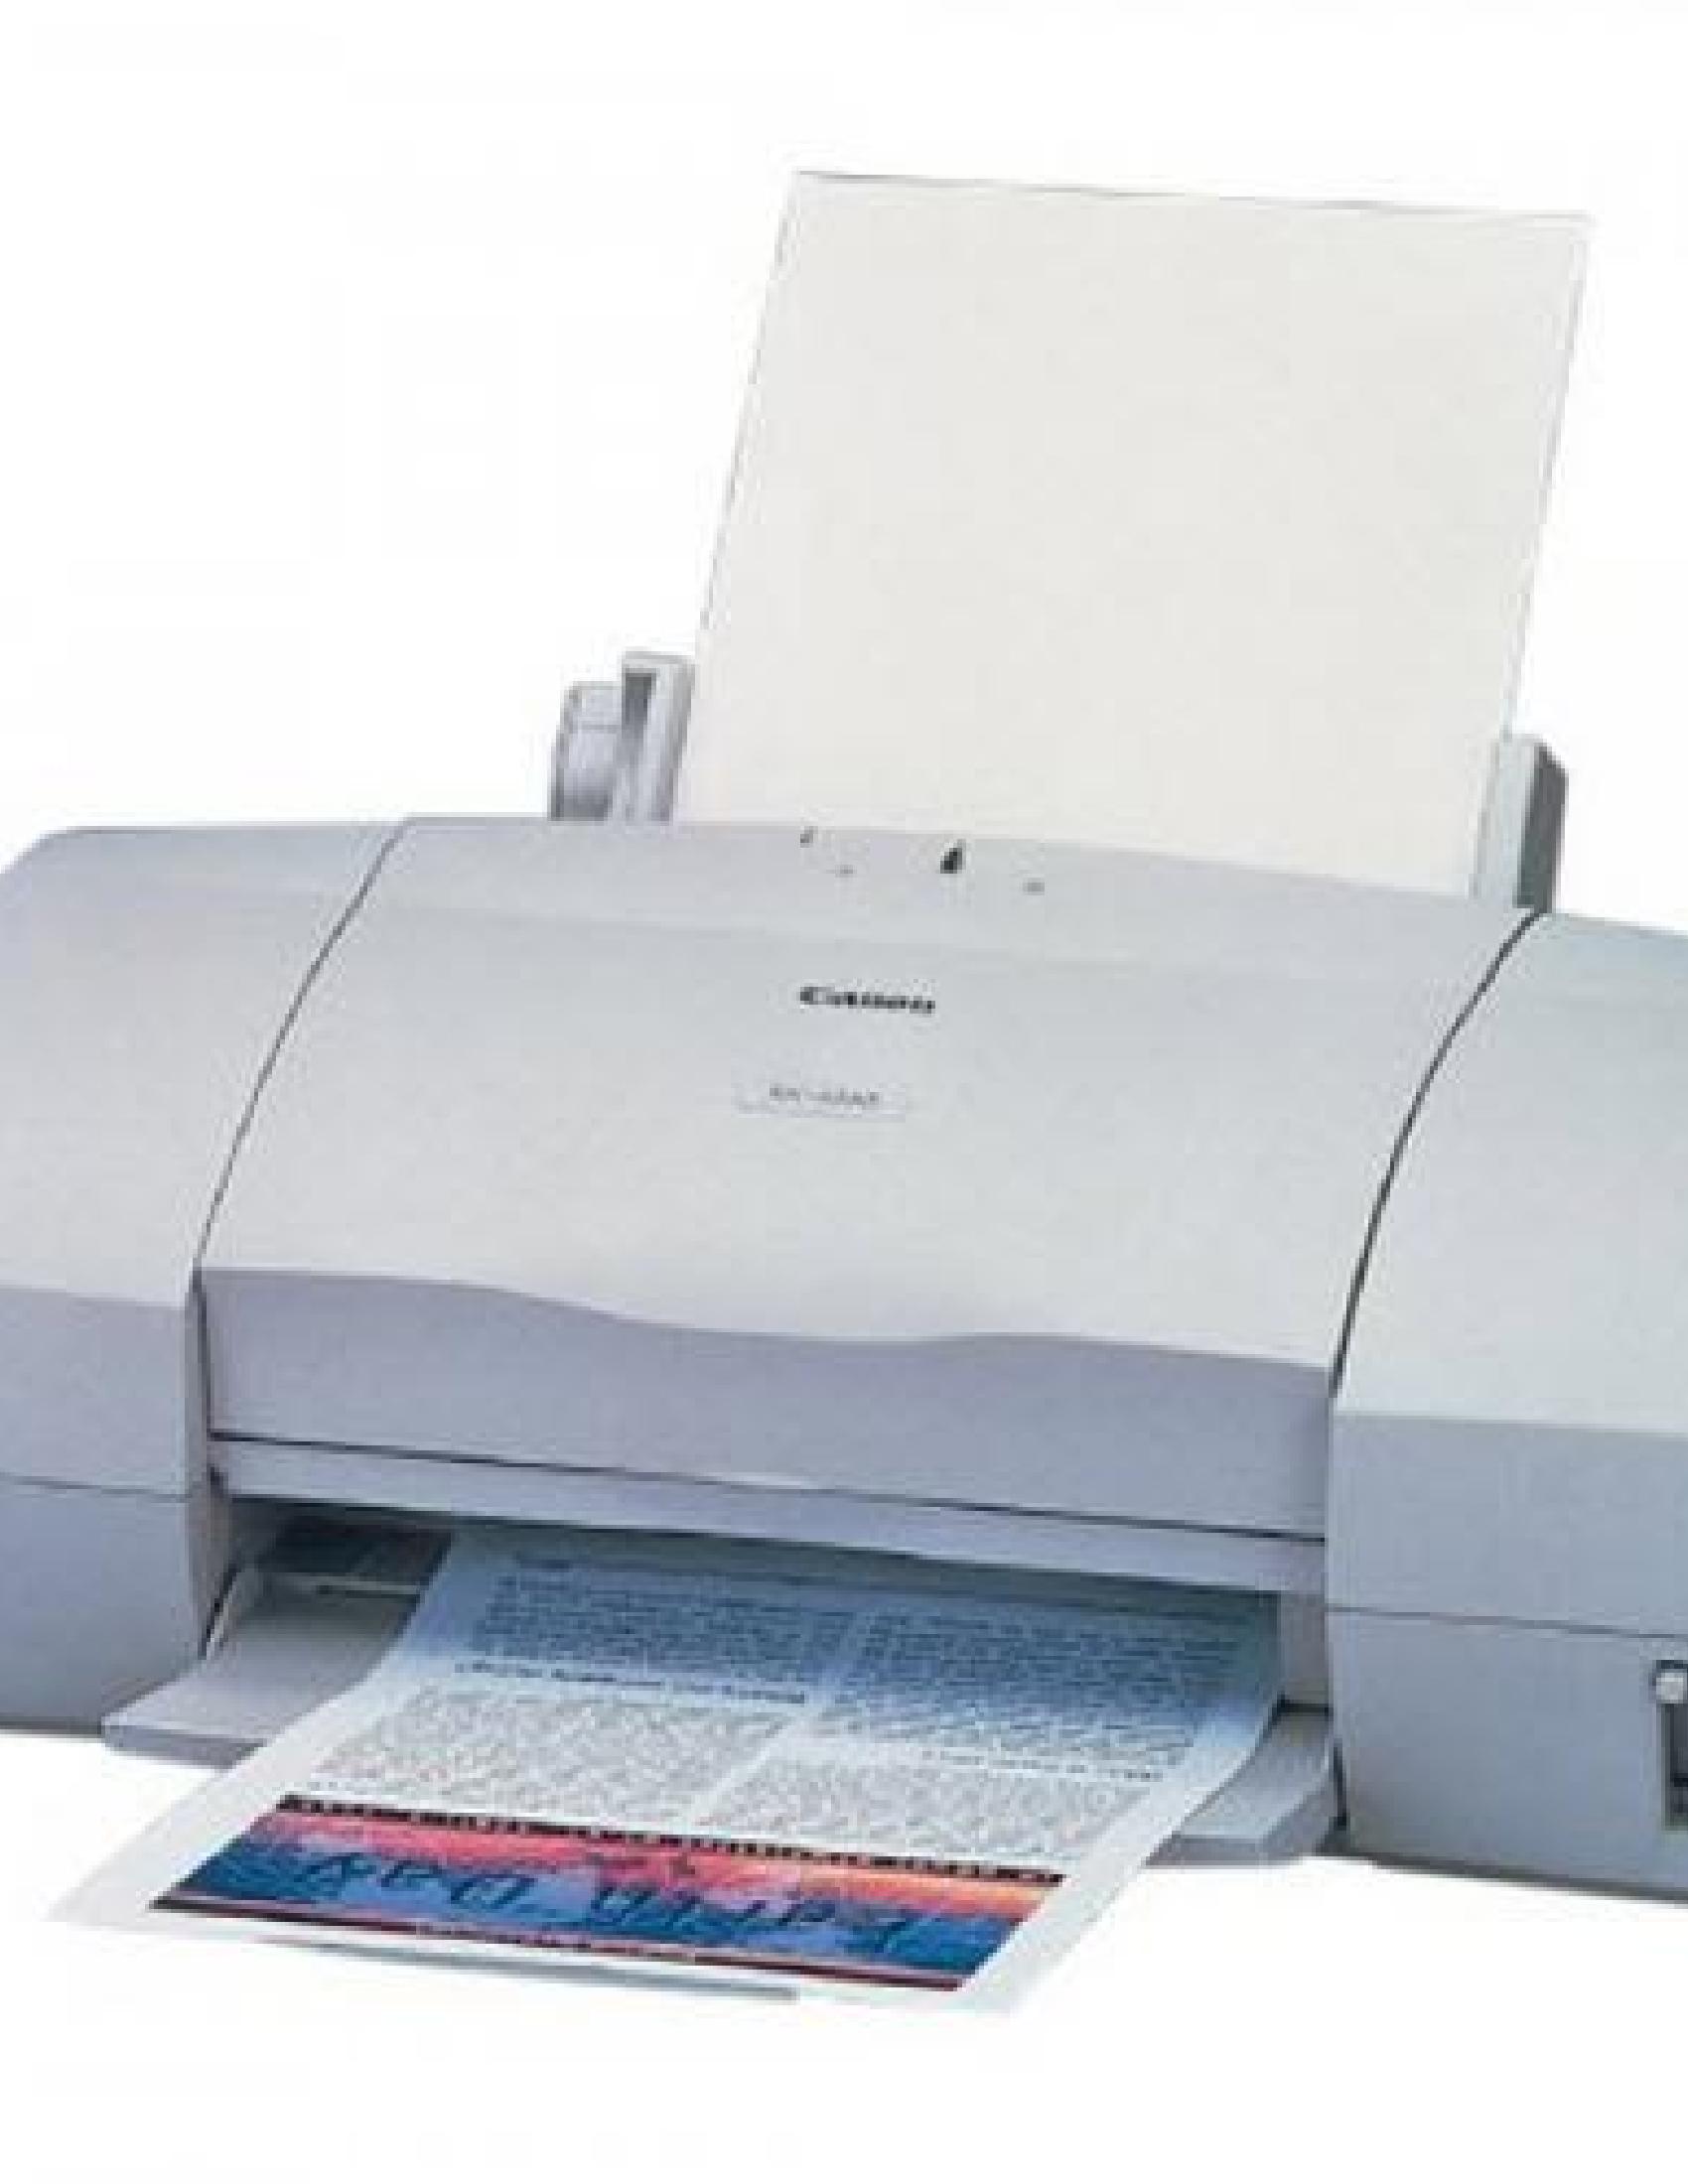 Canon BJC-6000 Printer manual